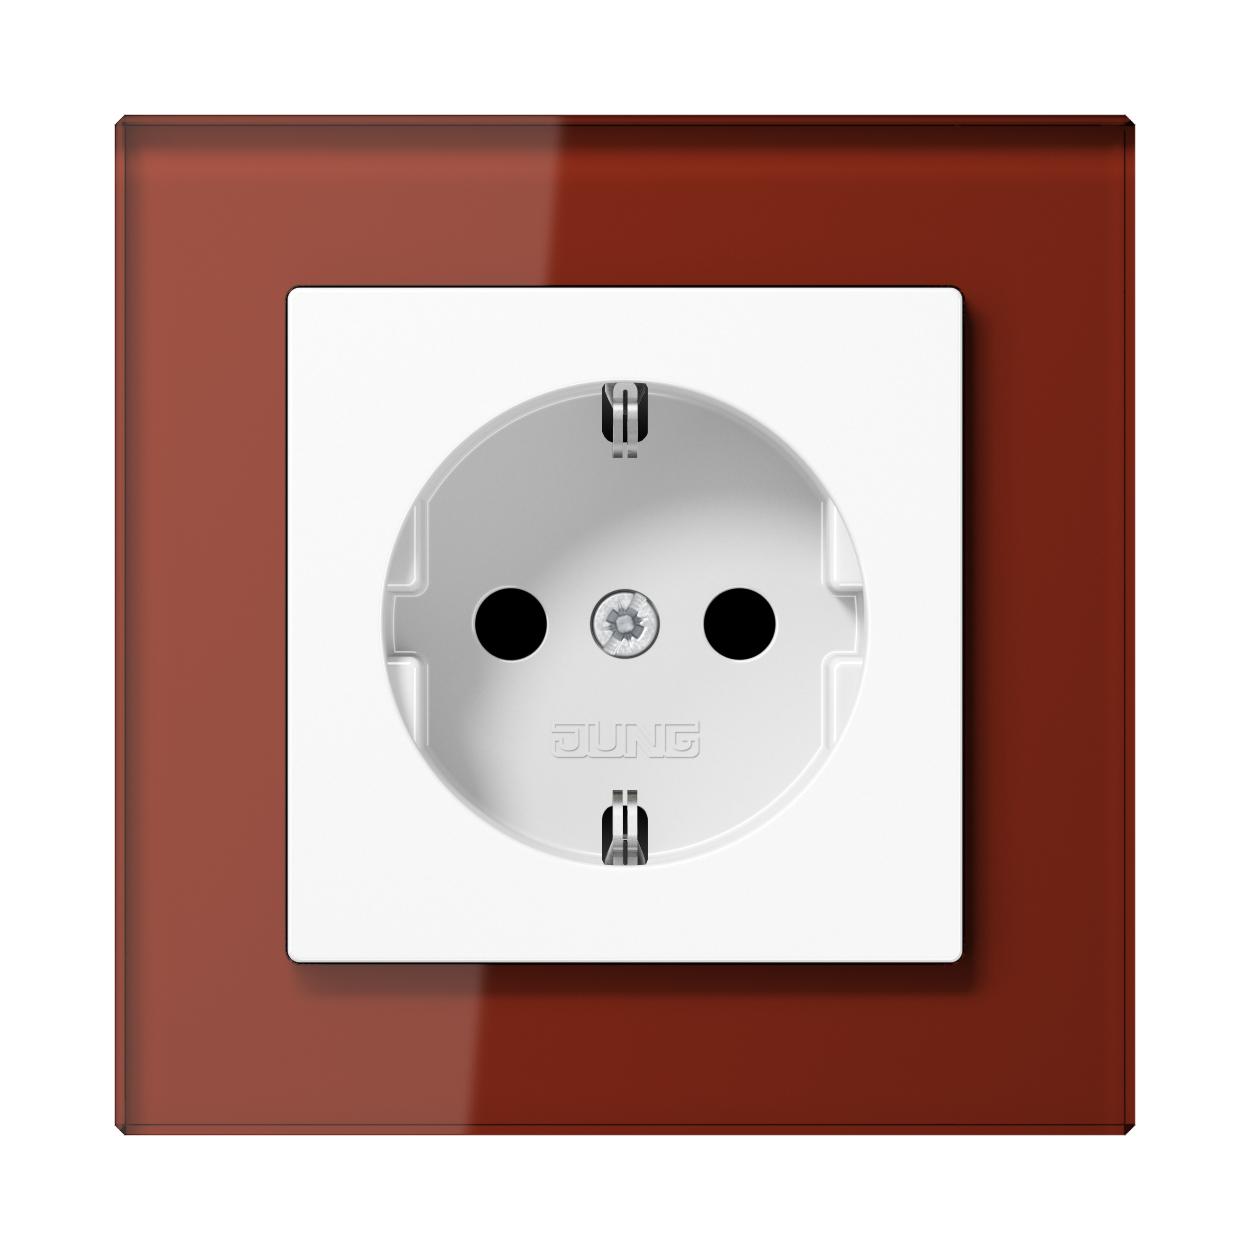 JUNG_AC_GL_red_socket